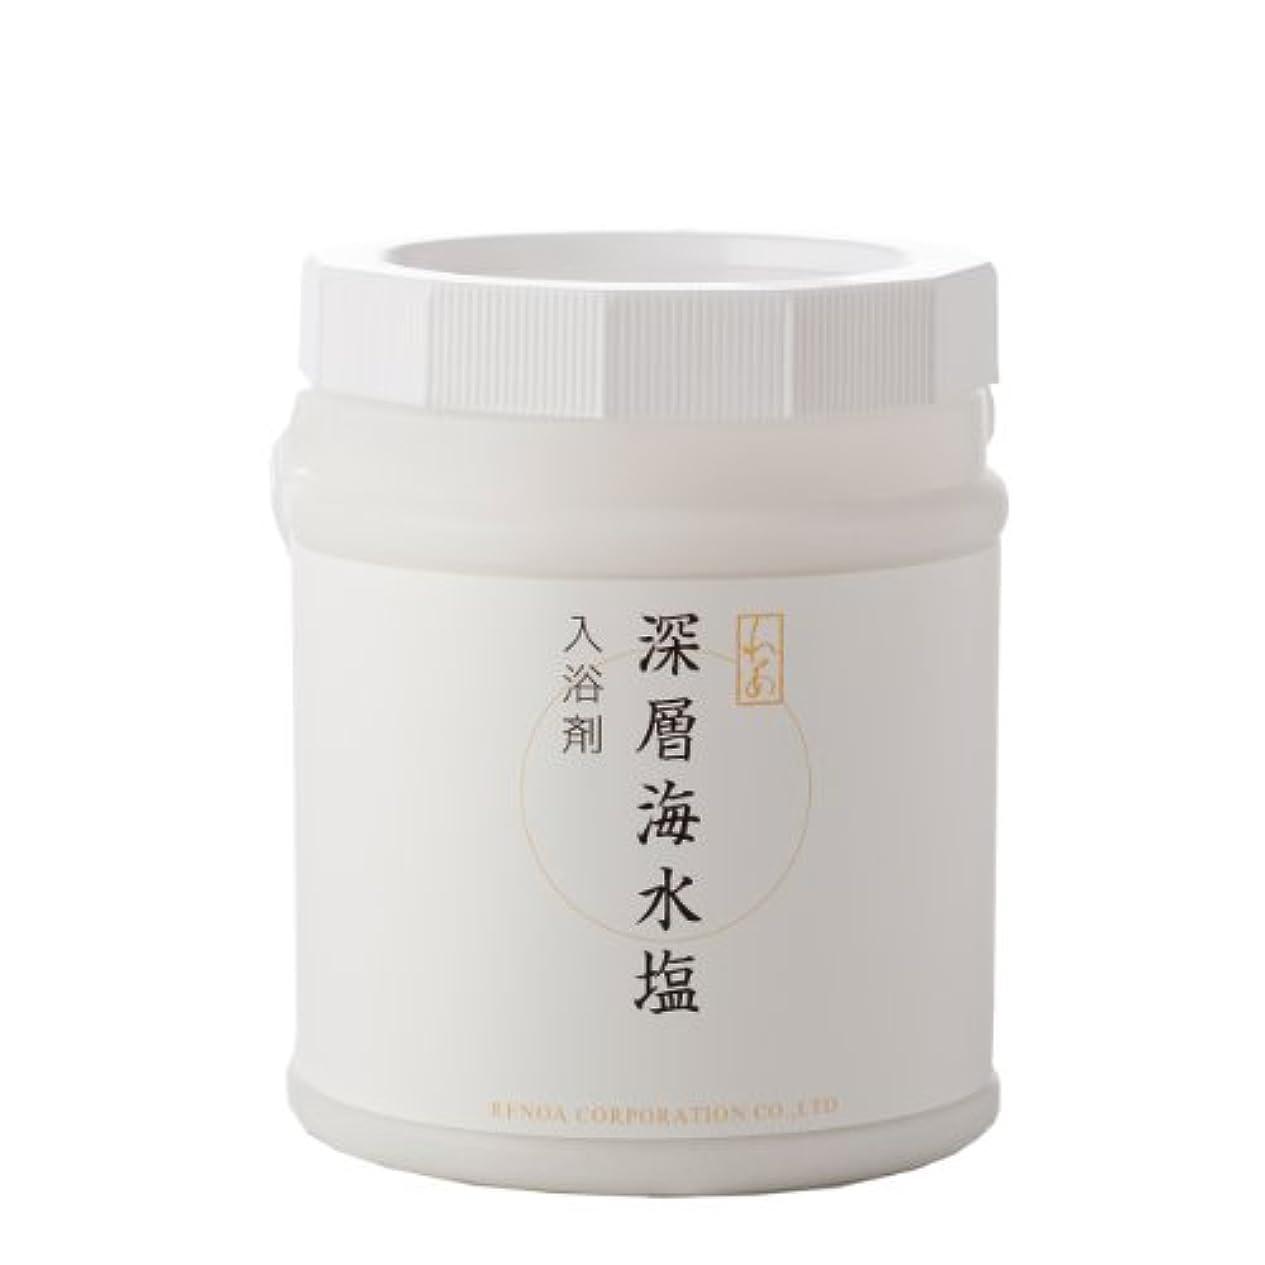 遺産信念招待深層海水塩 入浴剤 1.0kg 『バスソルト』